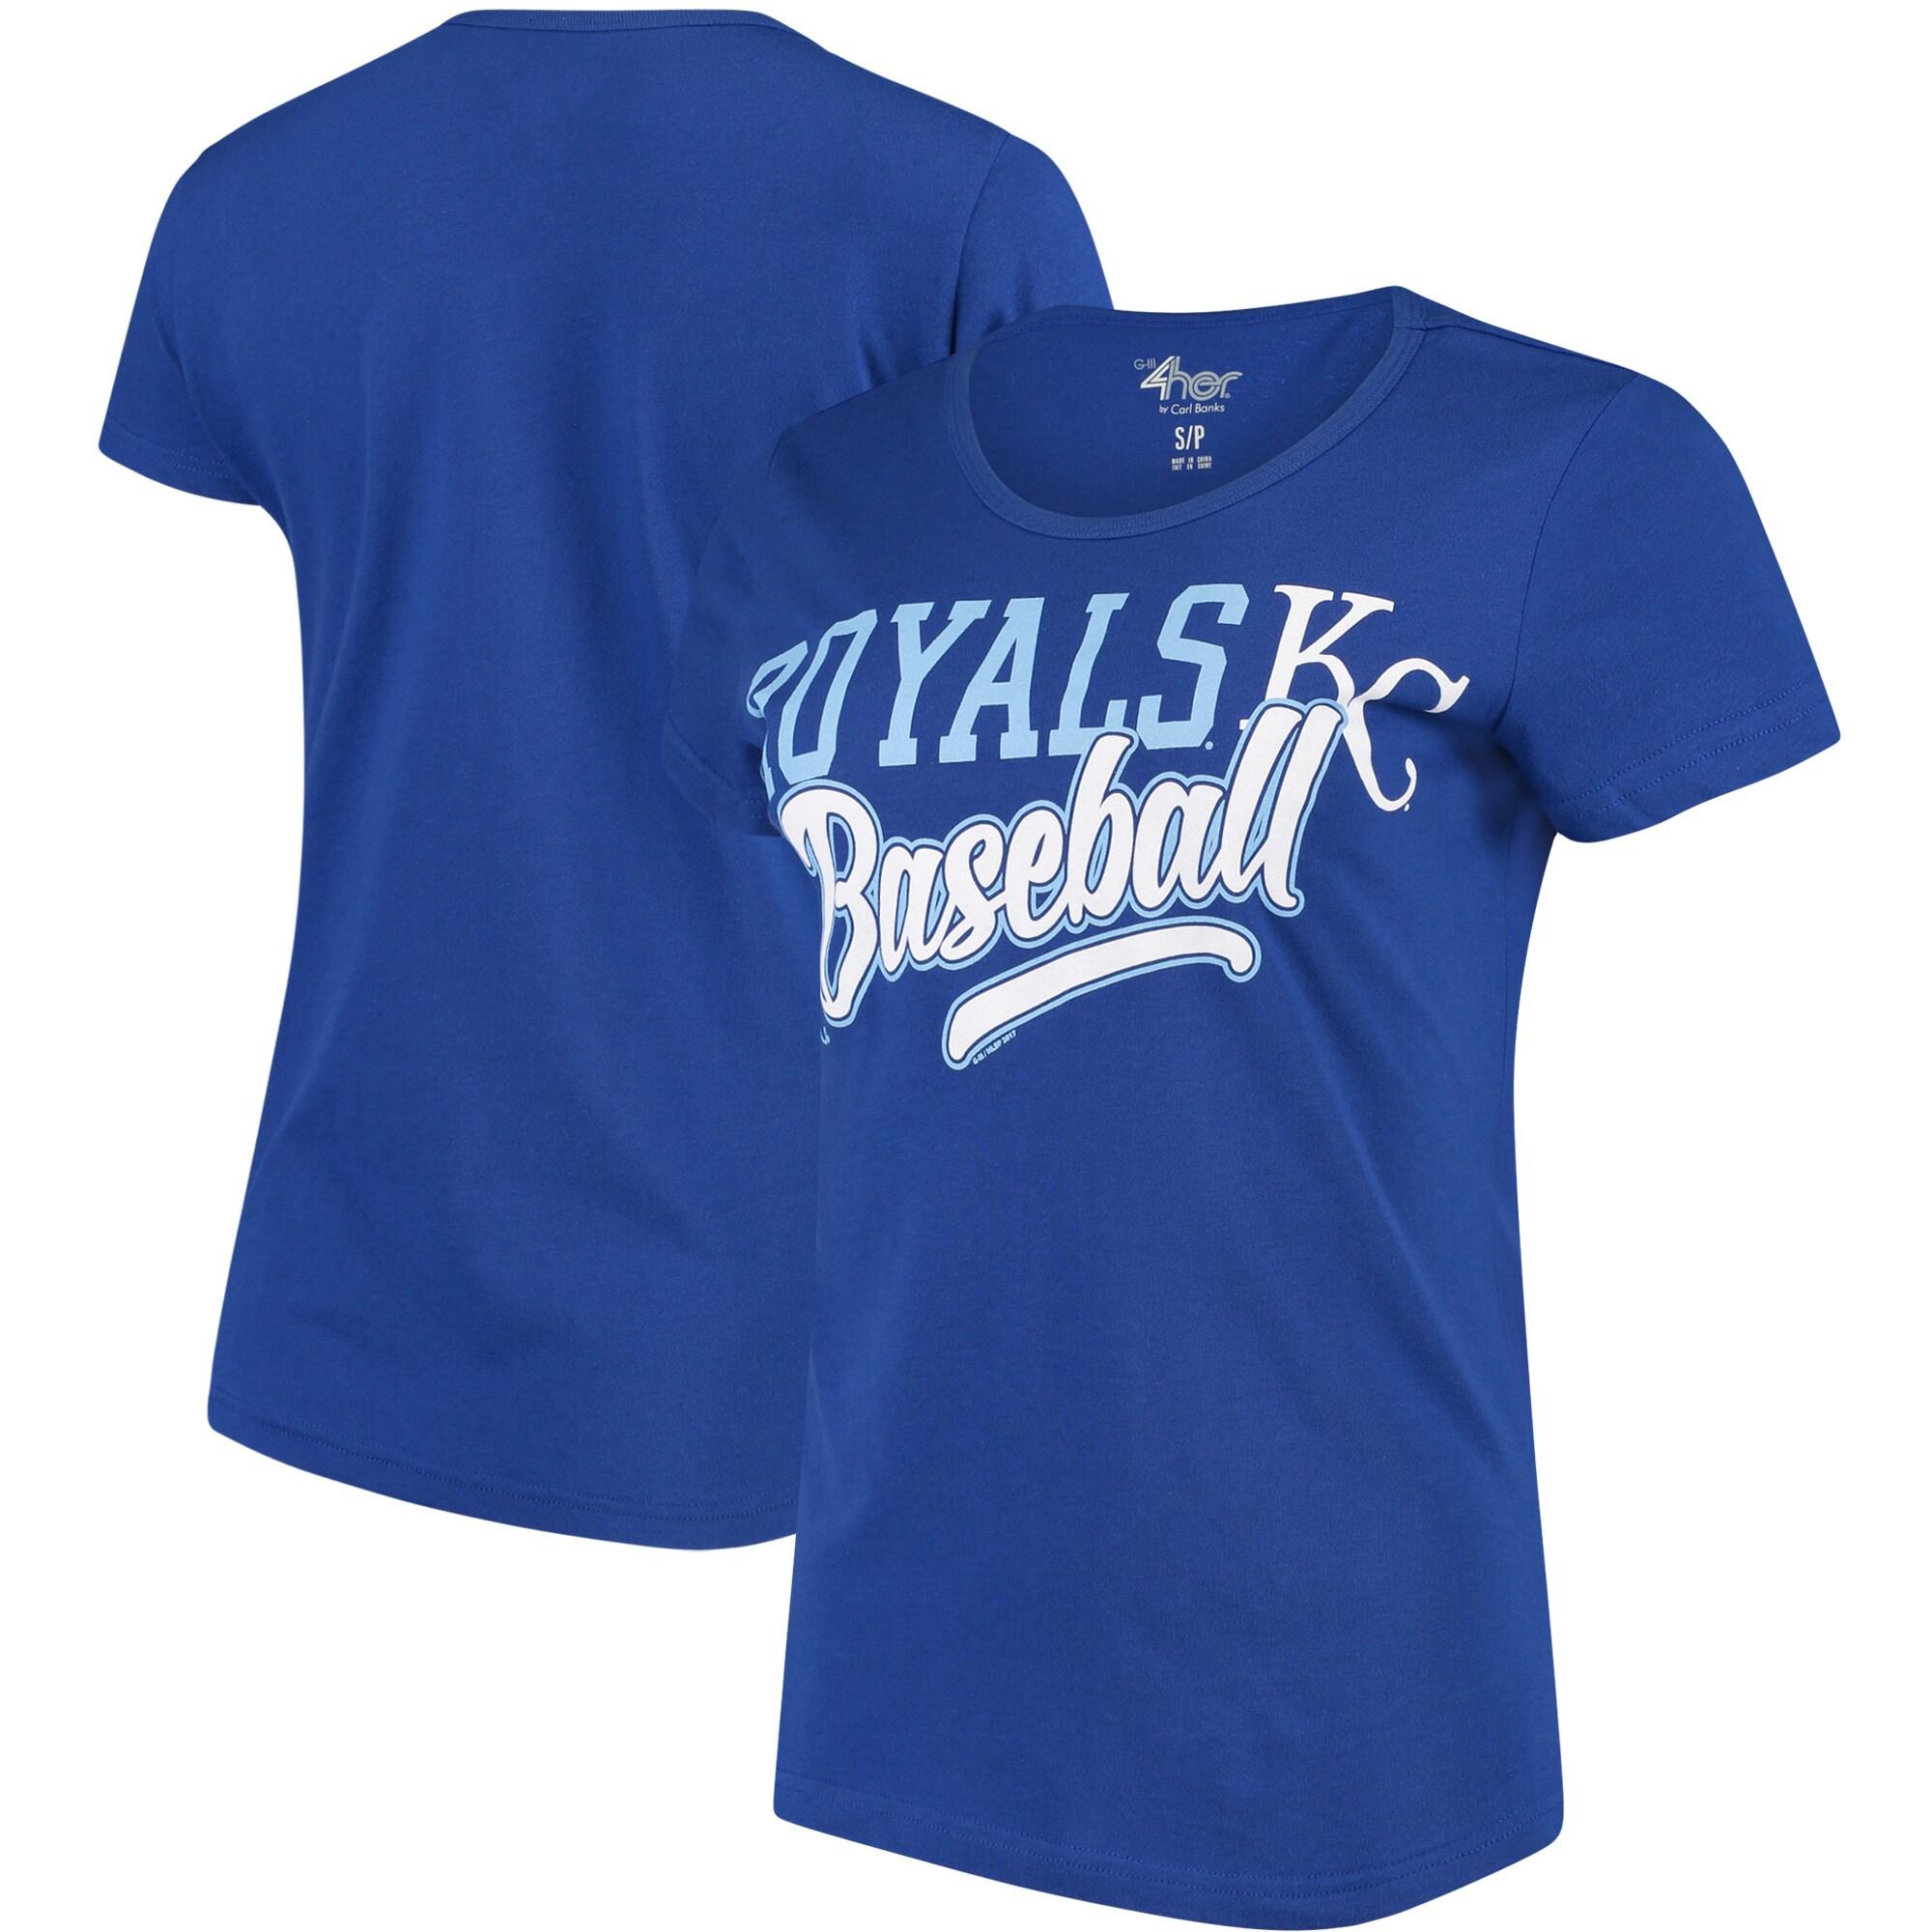 Kansas City Royals G-III 4Her by Carl Banks Women's Endzone Fashion T-Shirt - Royal